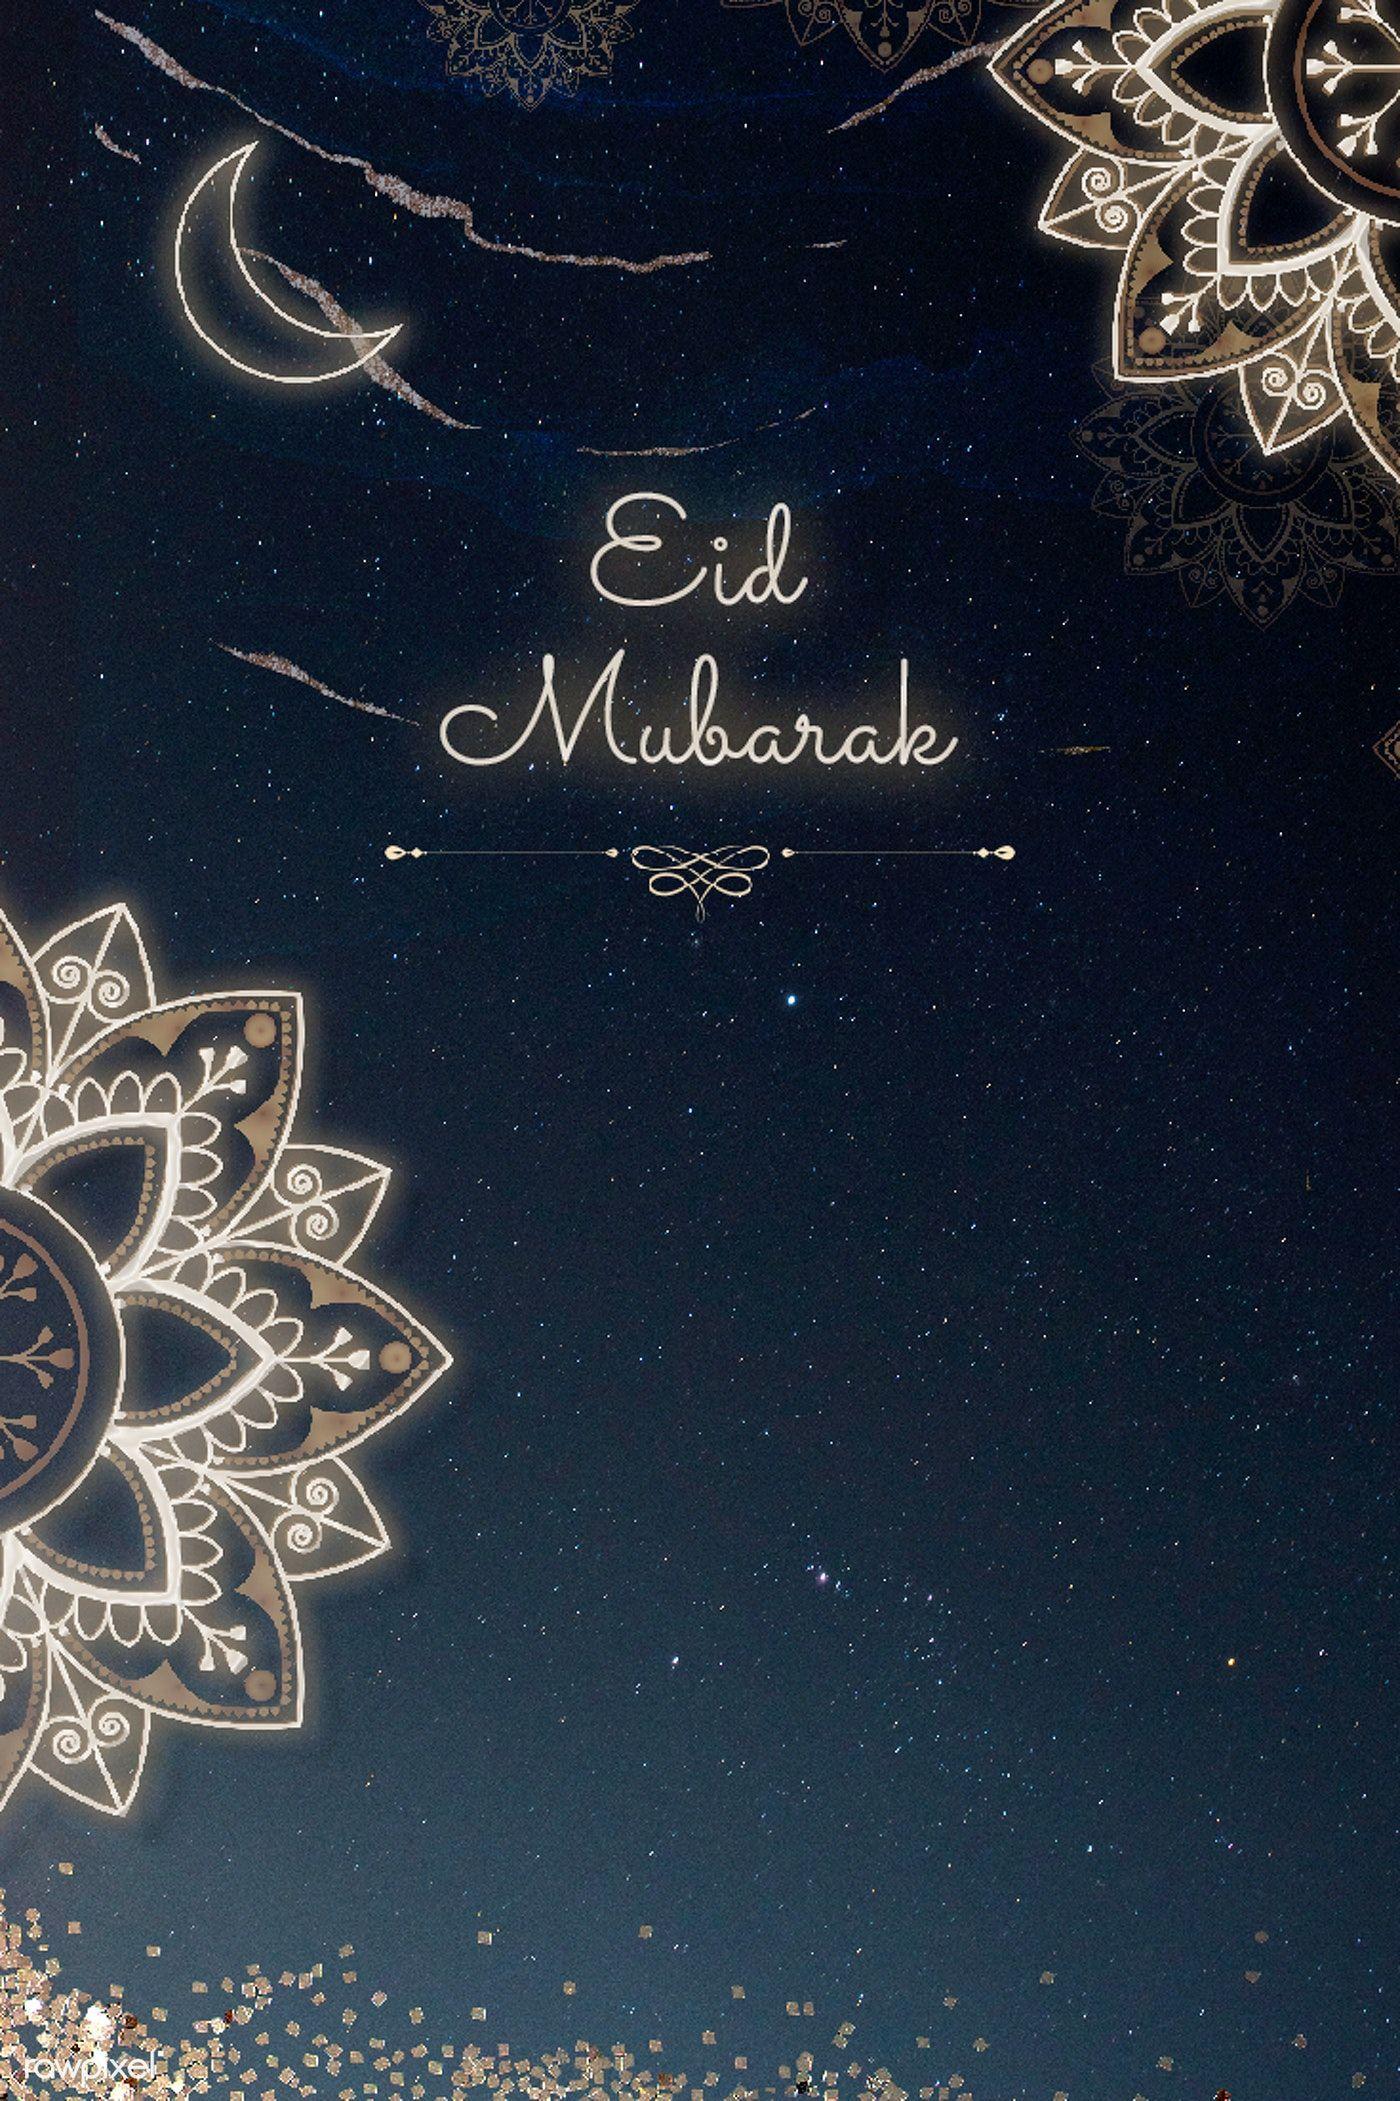 Eid Mubarak 2020 HD iPhone Wallpapers - Wallpaper Cave